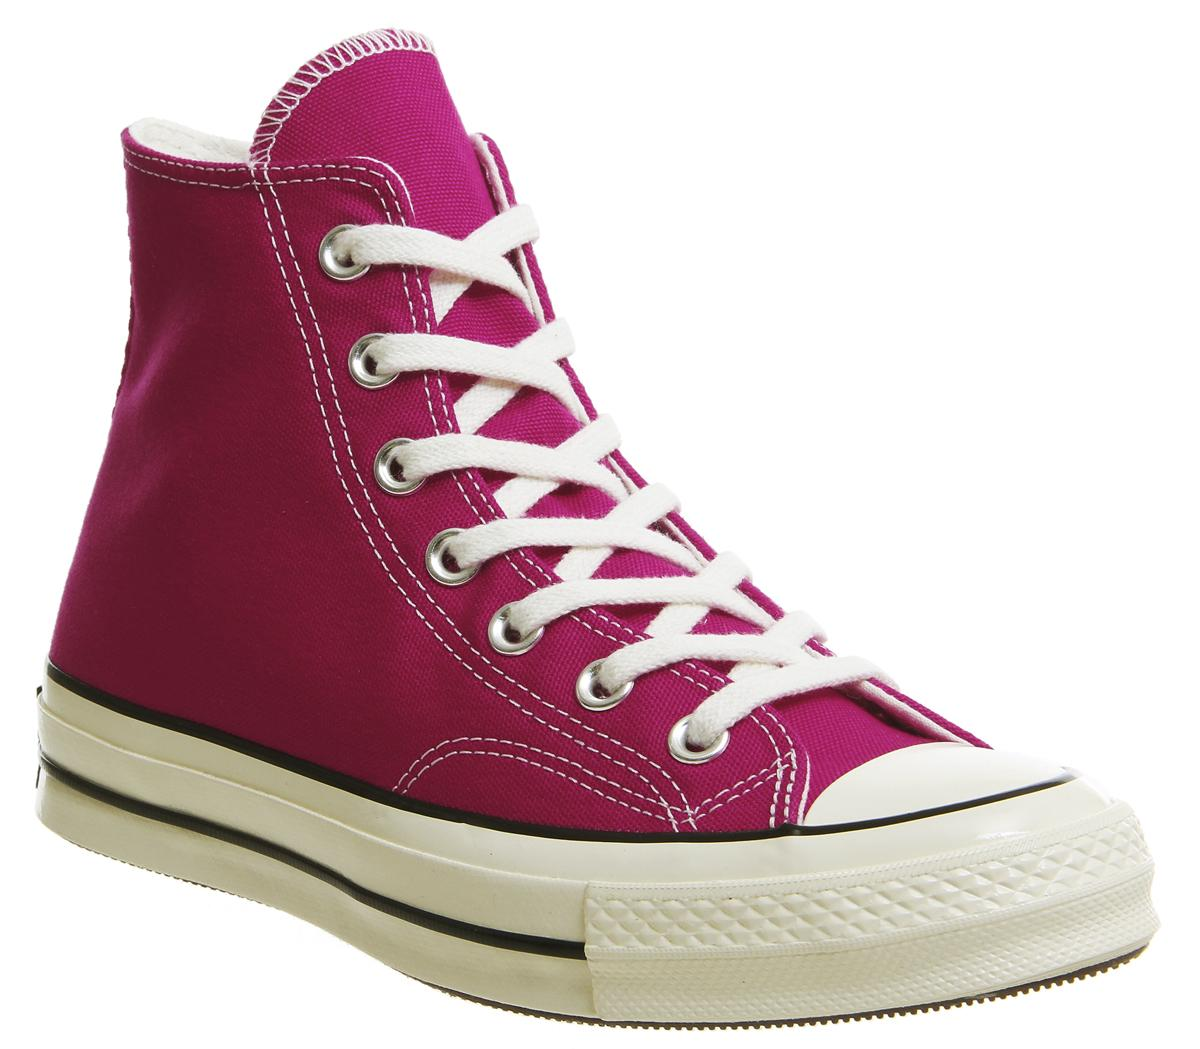 8c3c467fd8d6 Converse All Star Hi 70 s Trainers Pink Pop Black Egret - Unisex Sports